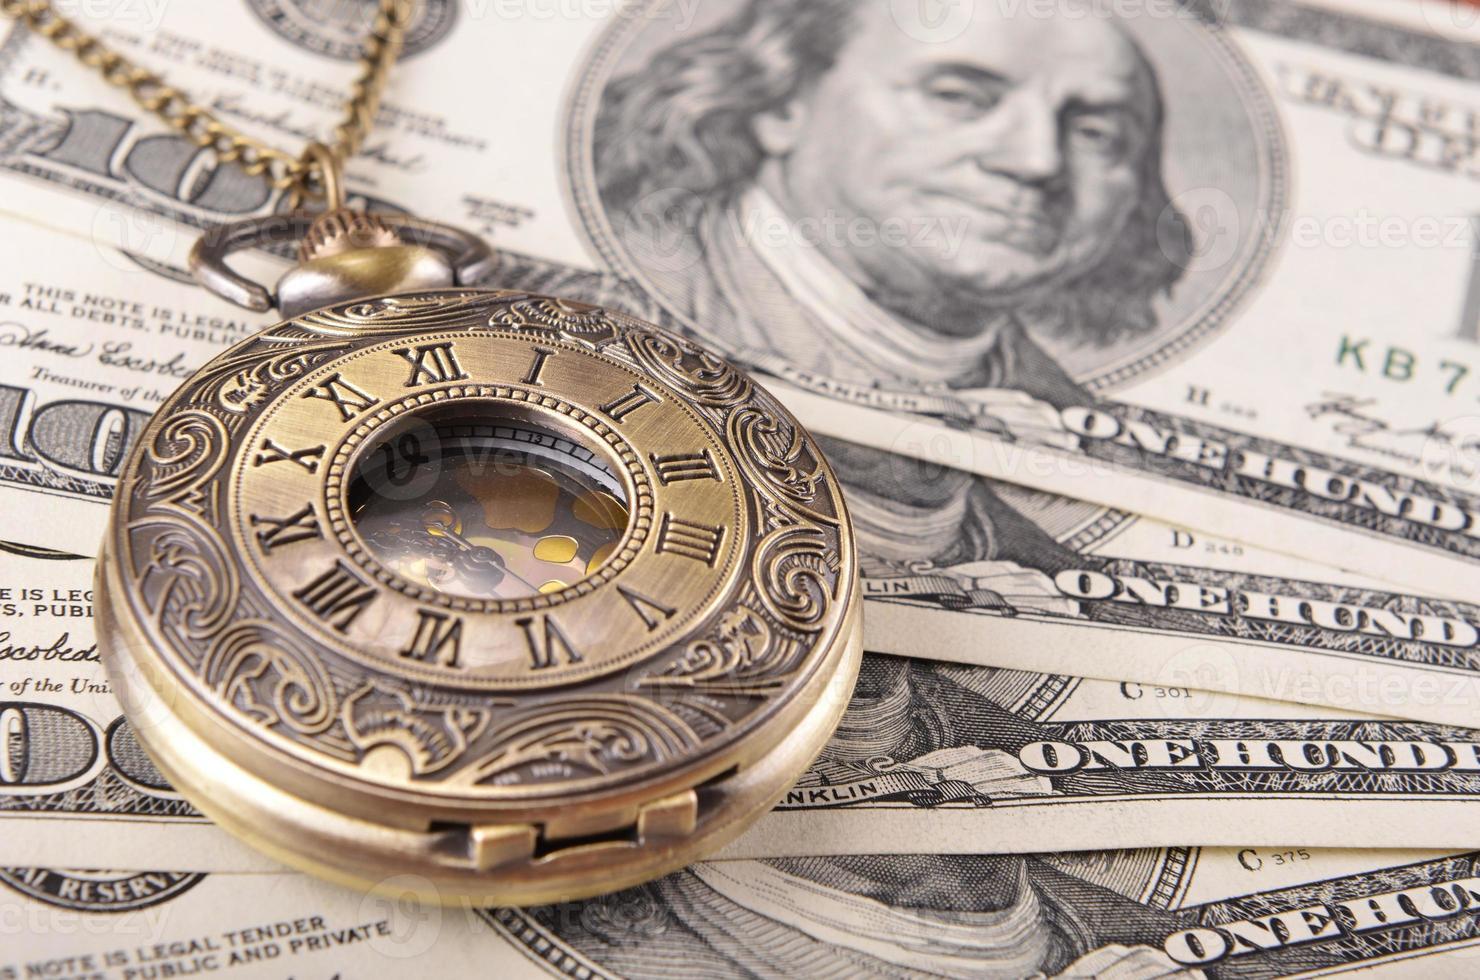 watch on the money photo